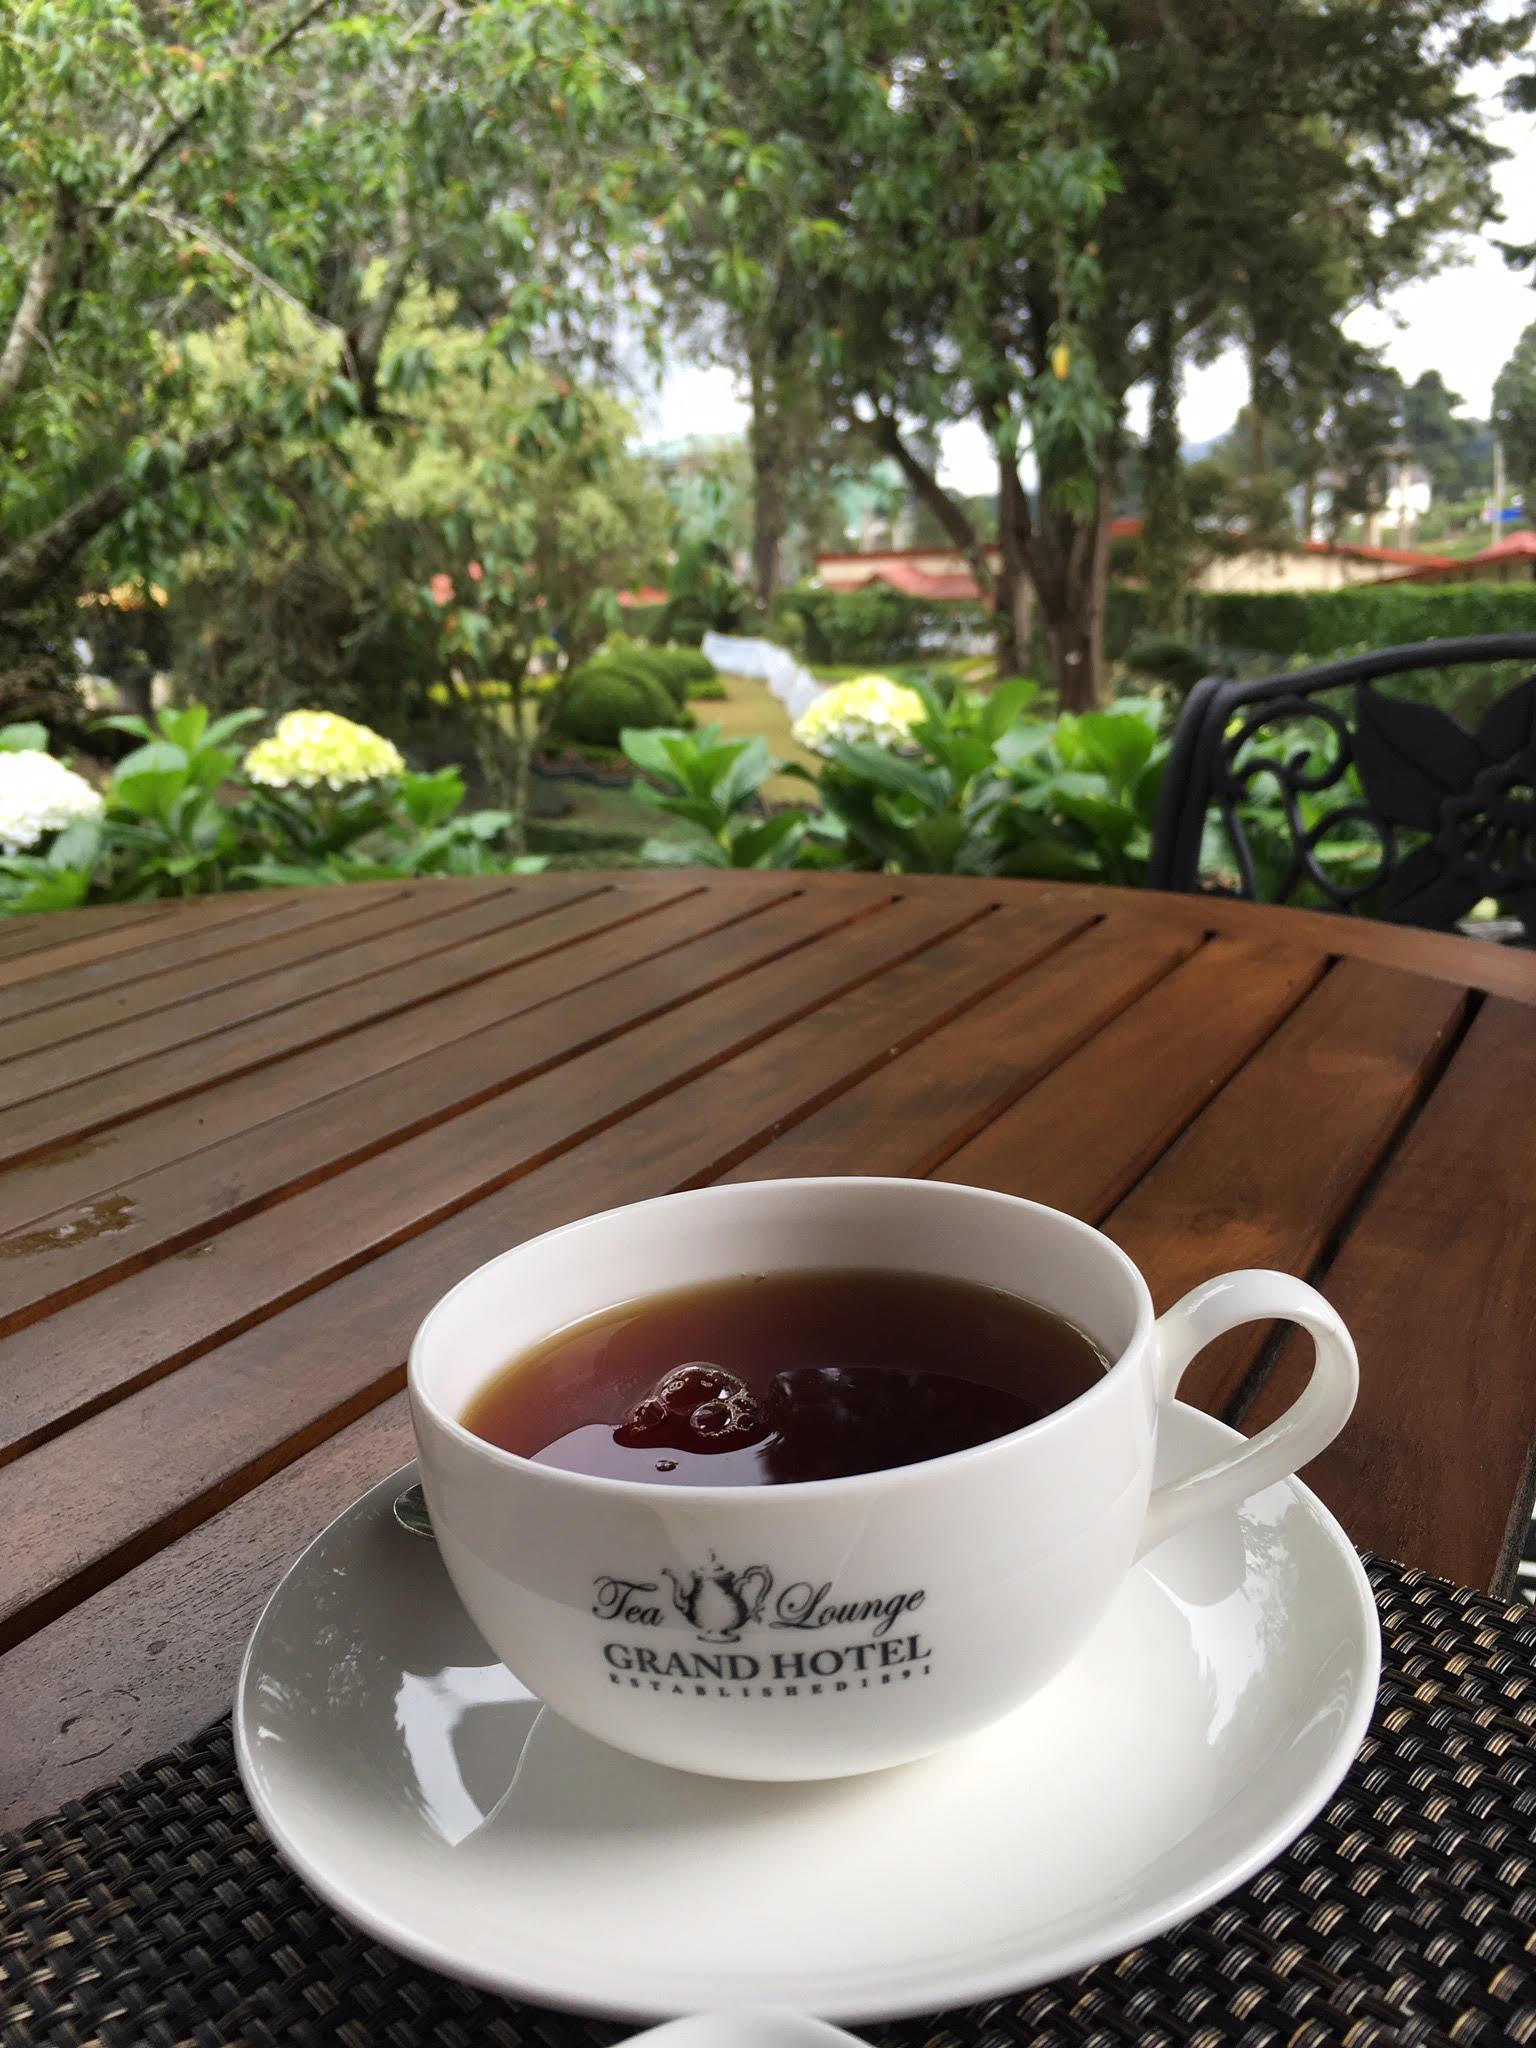 Orange tea in Sri Lanka. Contributed by Flying Fluskey.